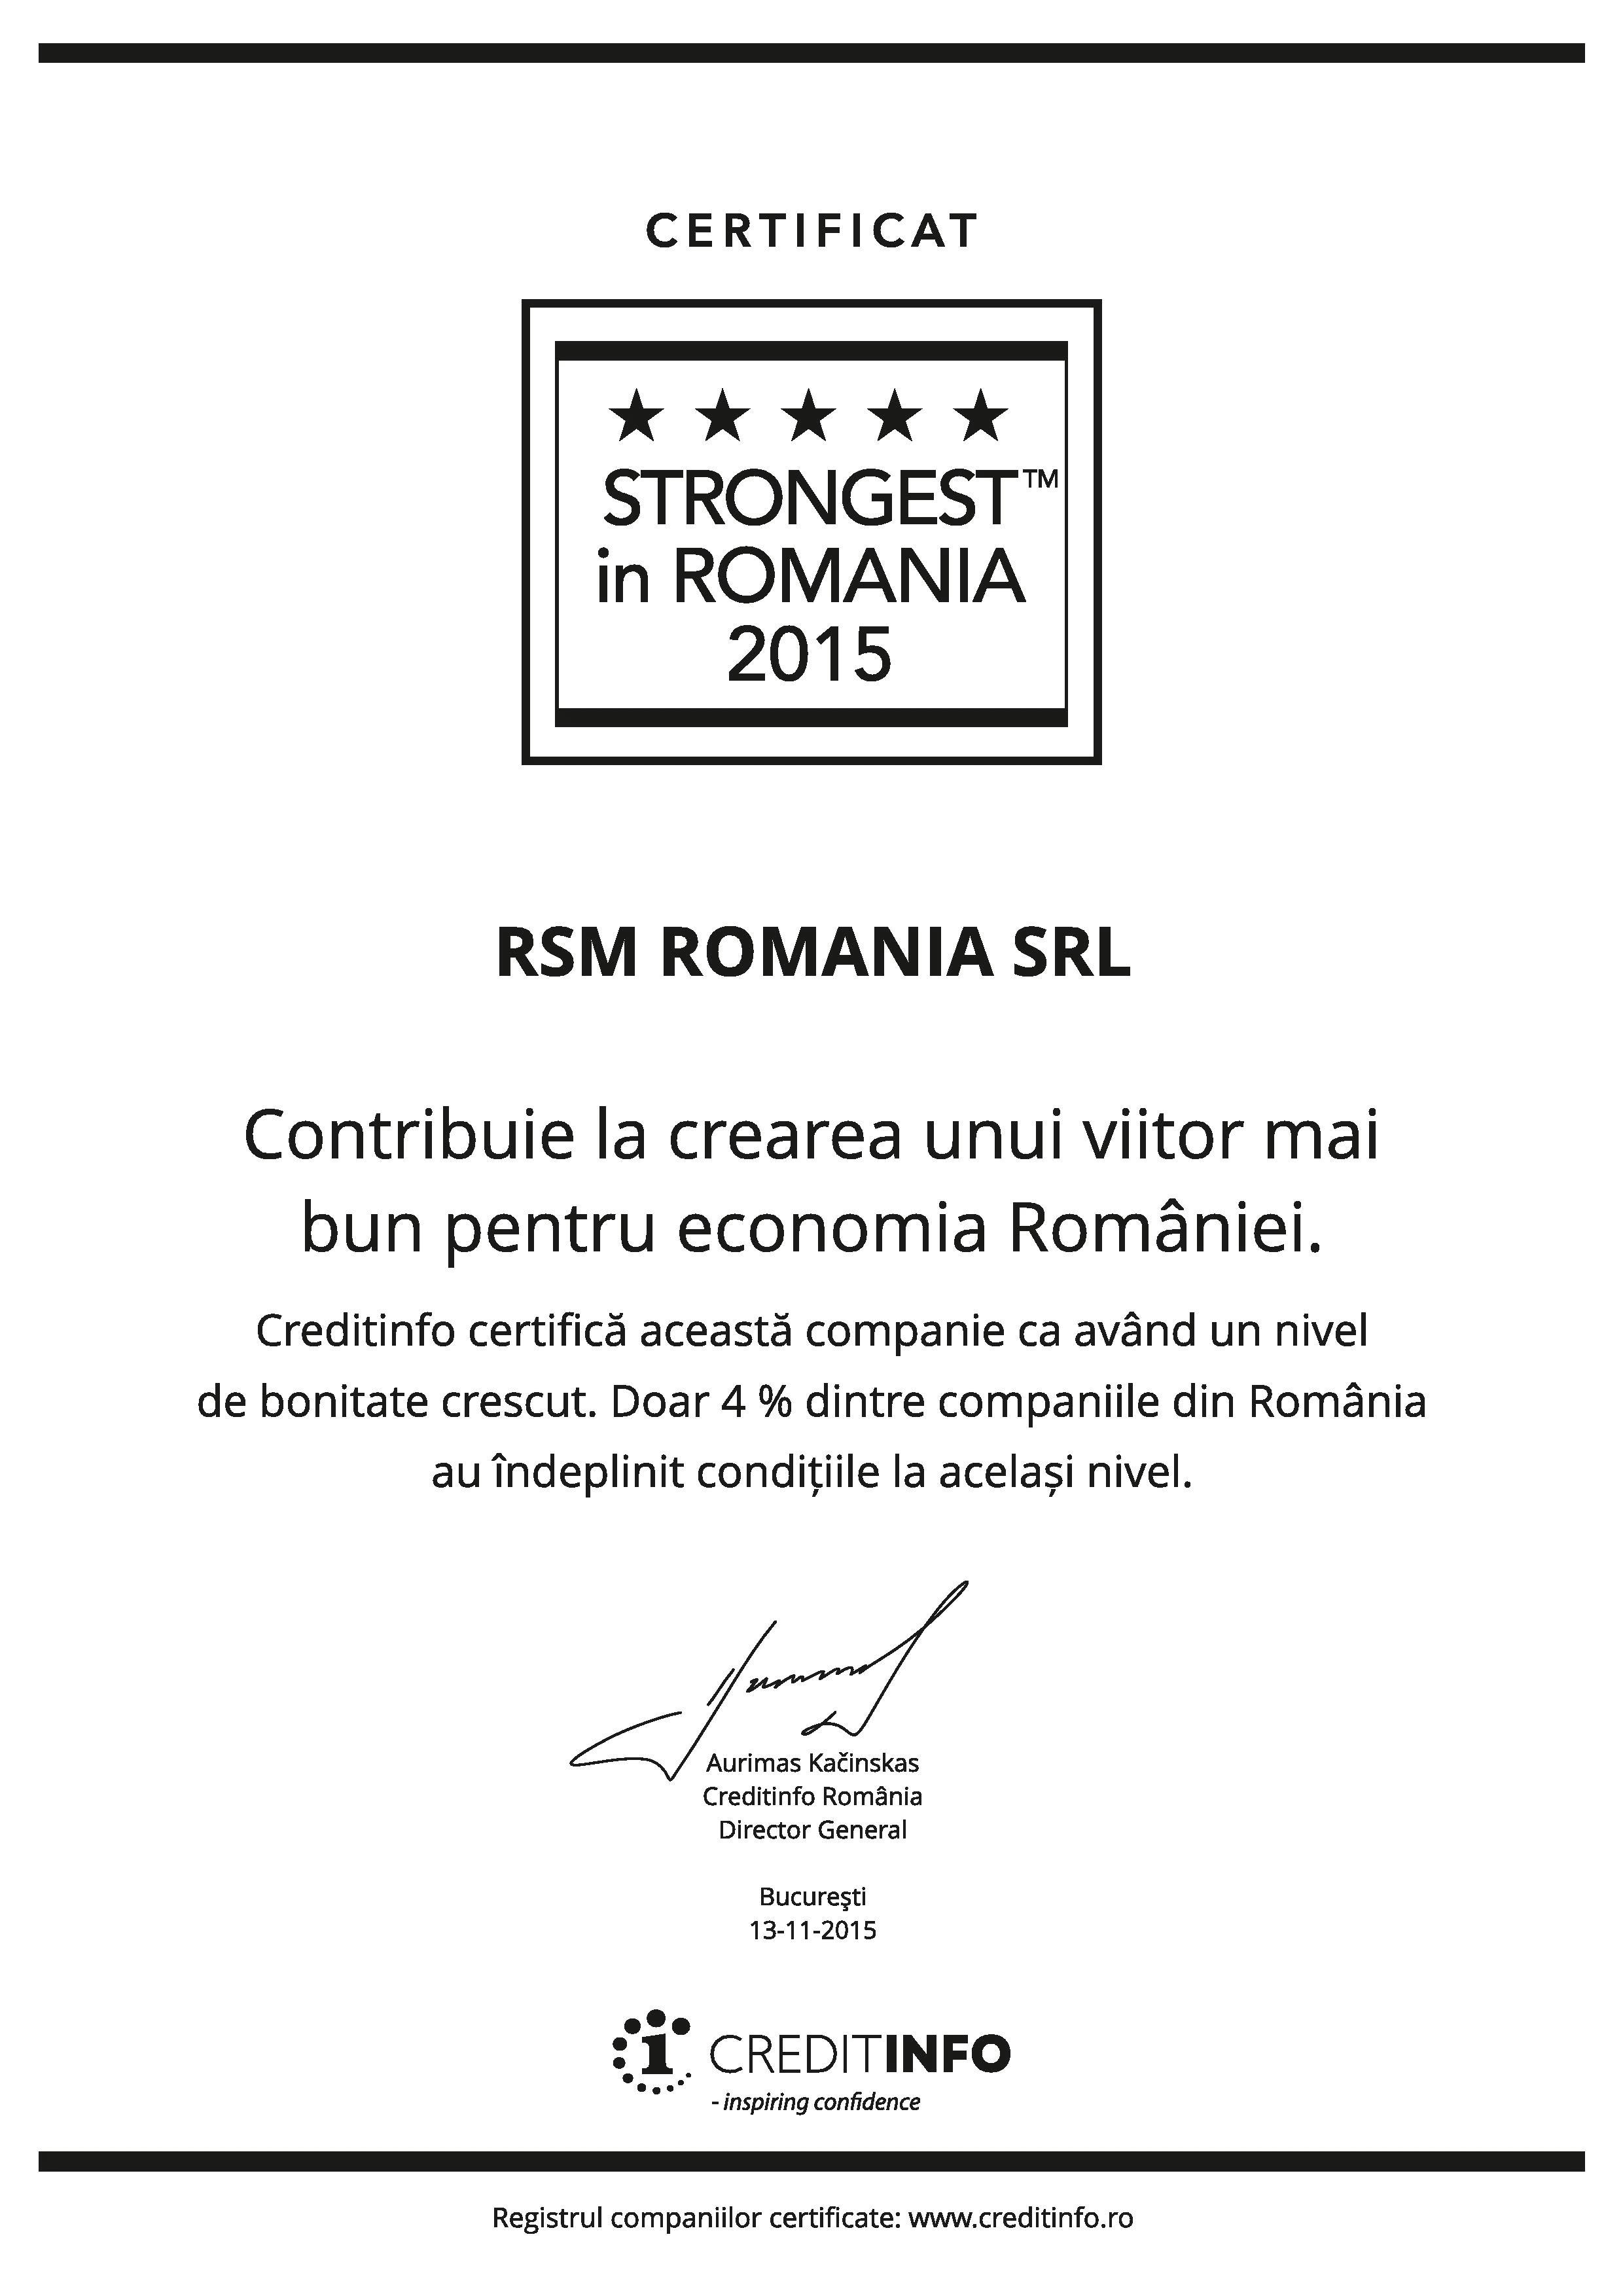 rsm_romania_strongest_in_romania.jpg